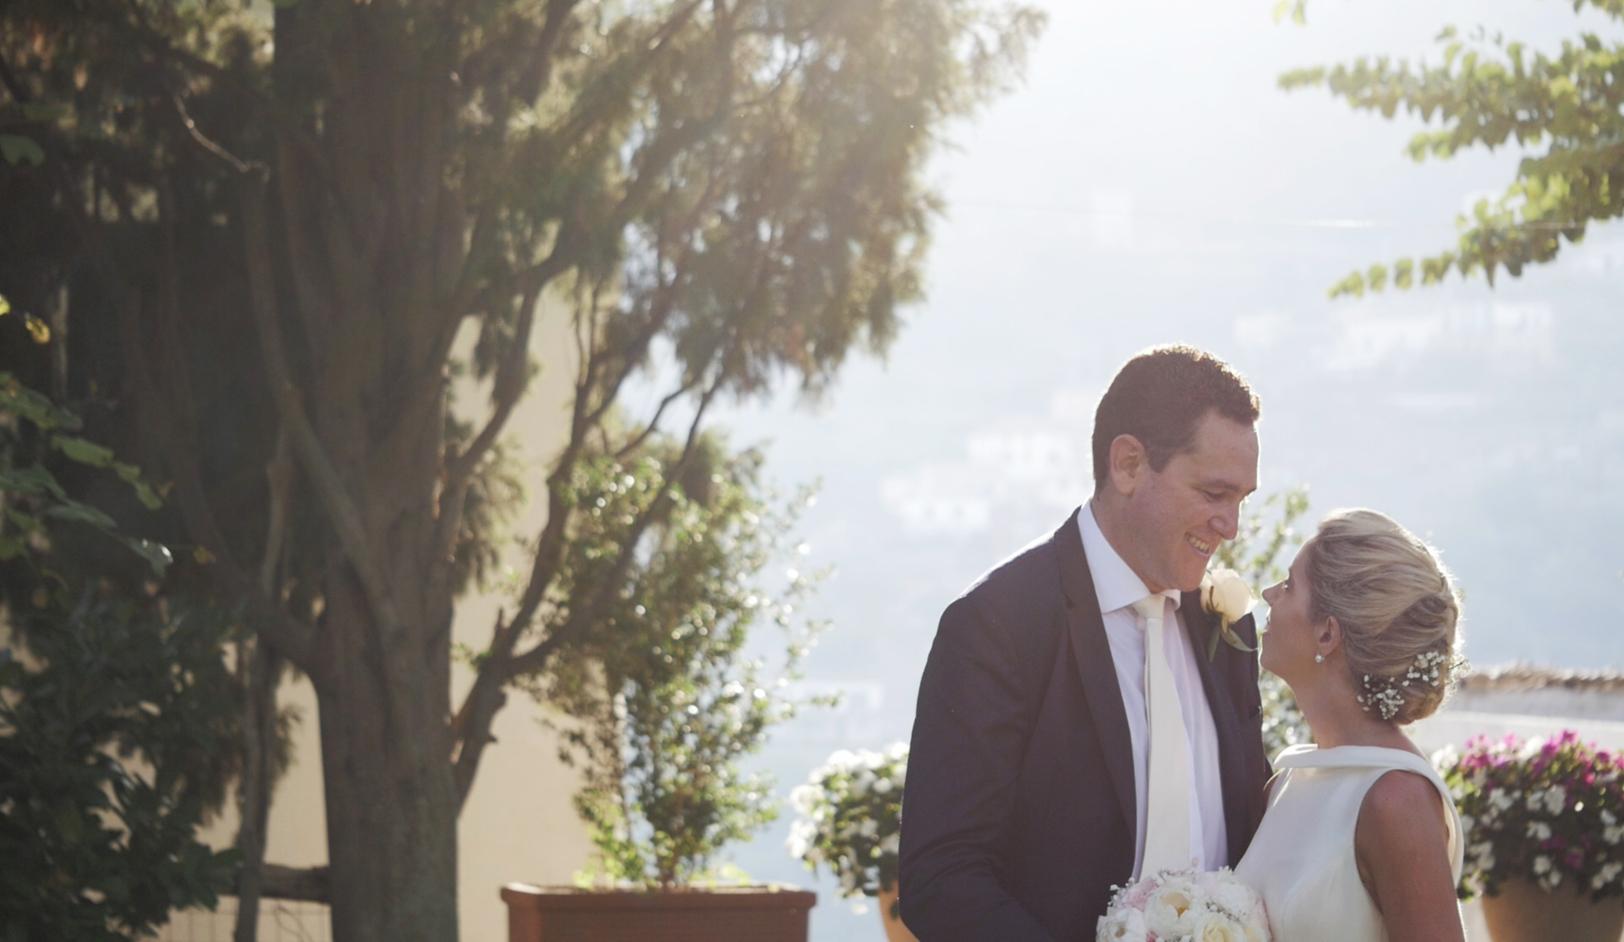 matrimonio-a-villa-eva-sposo-sposa-ravello-italia.jpg